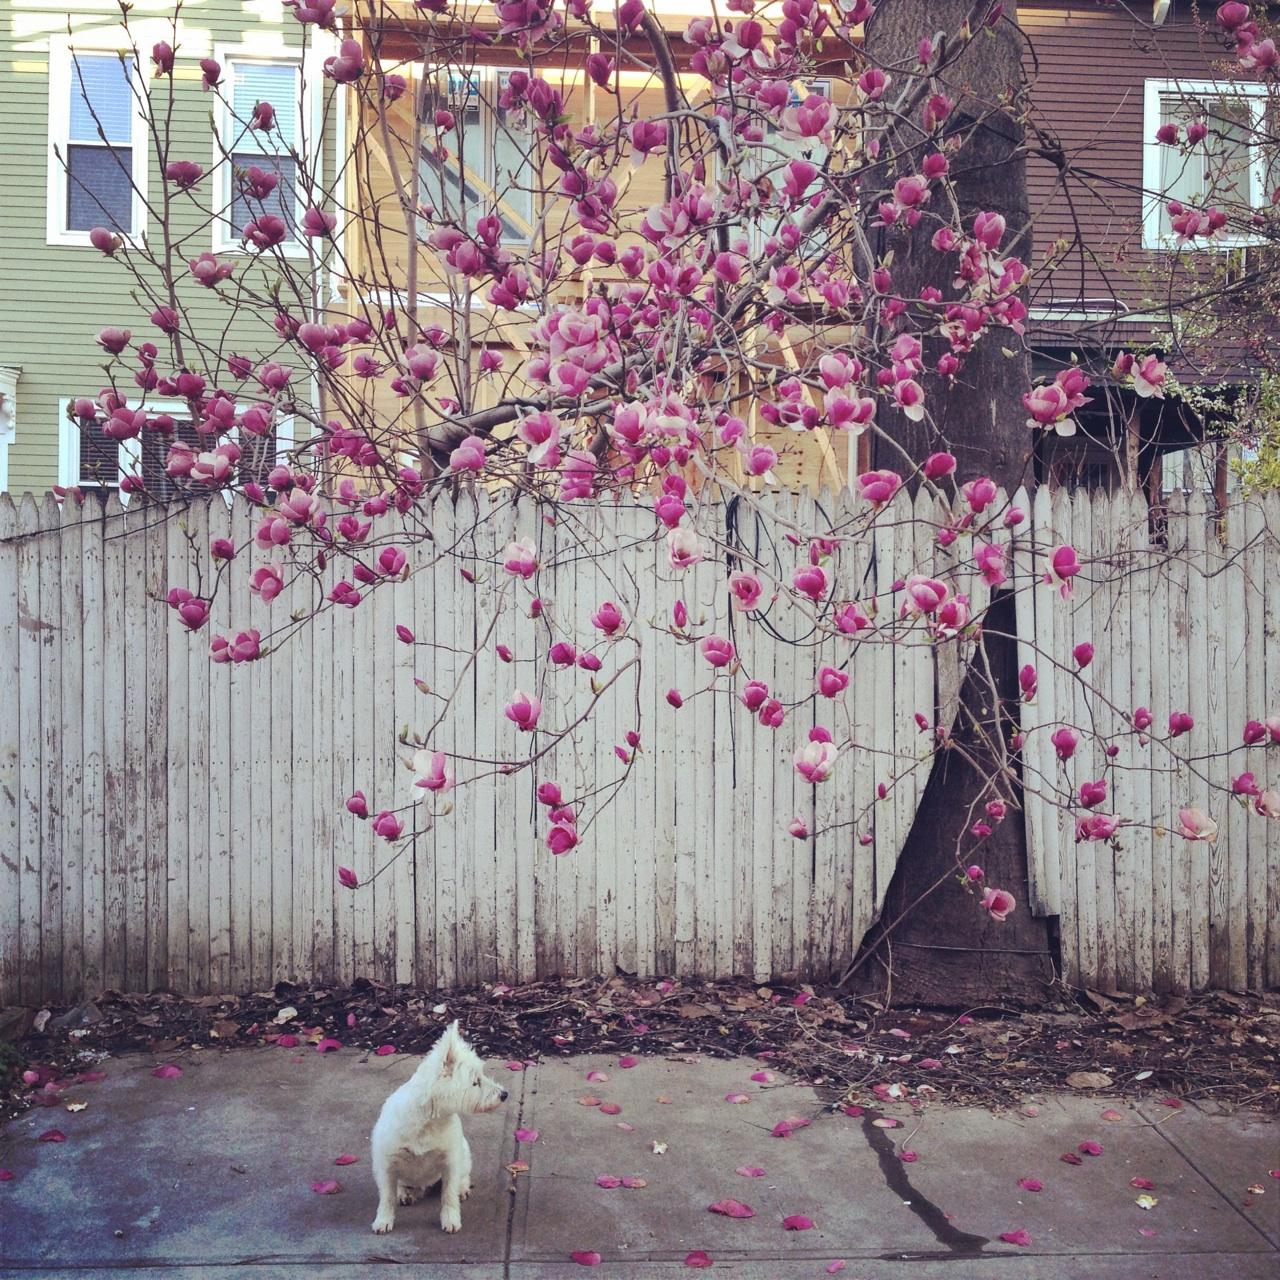 Williamsburg backyard, Photo by Arianne Keegan